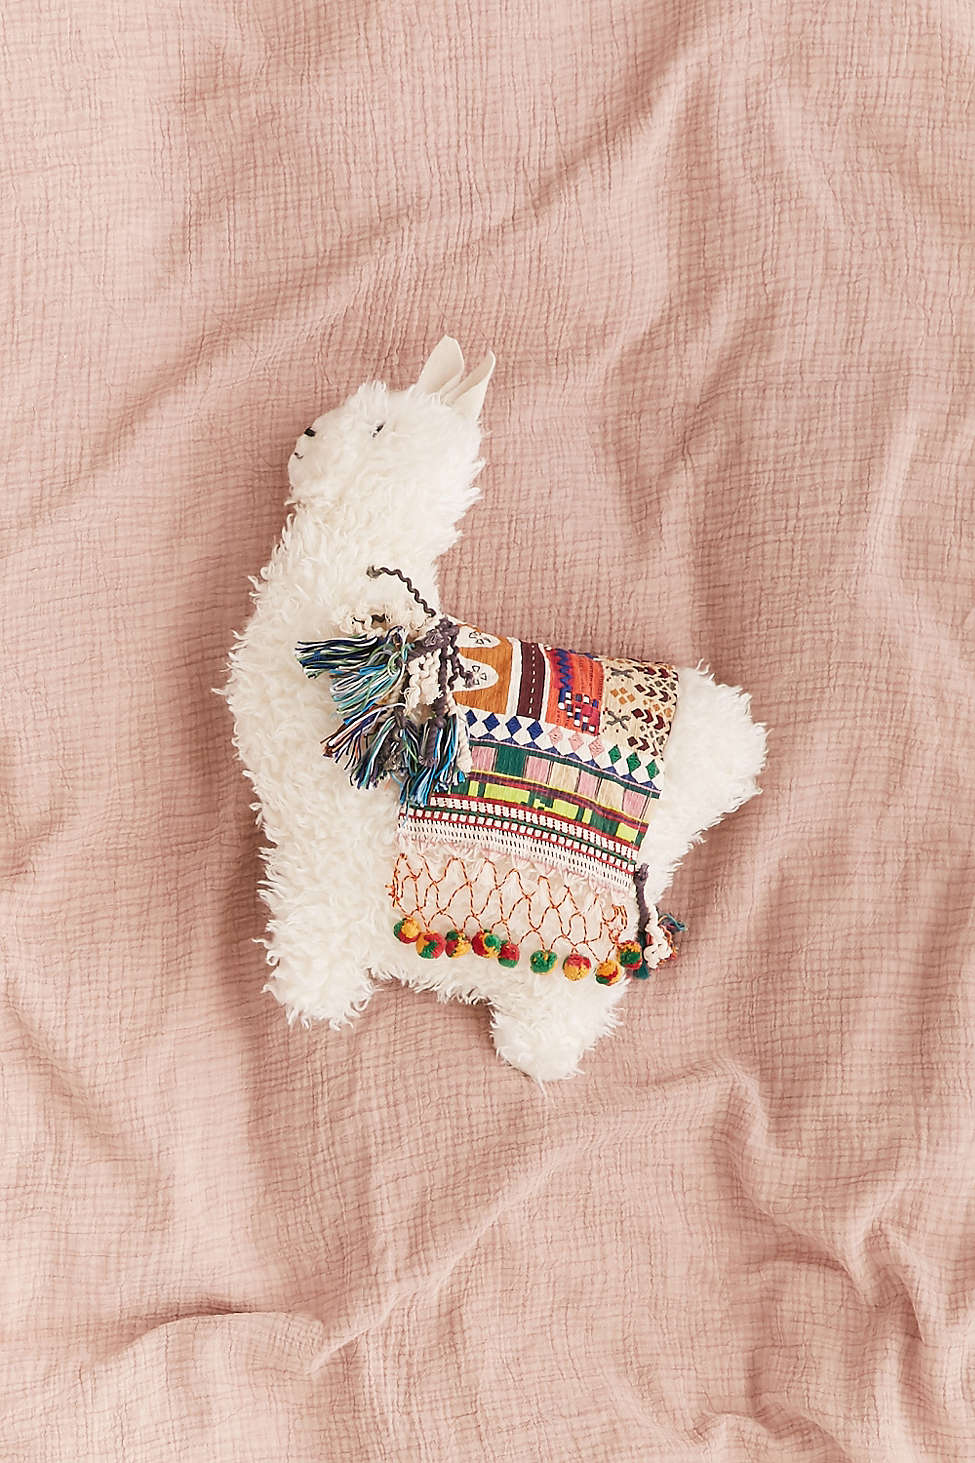 furry llama gifts